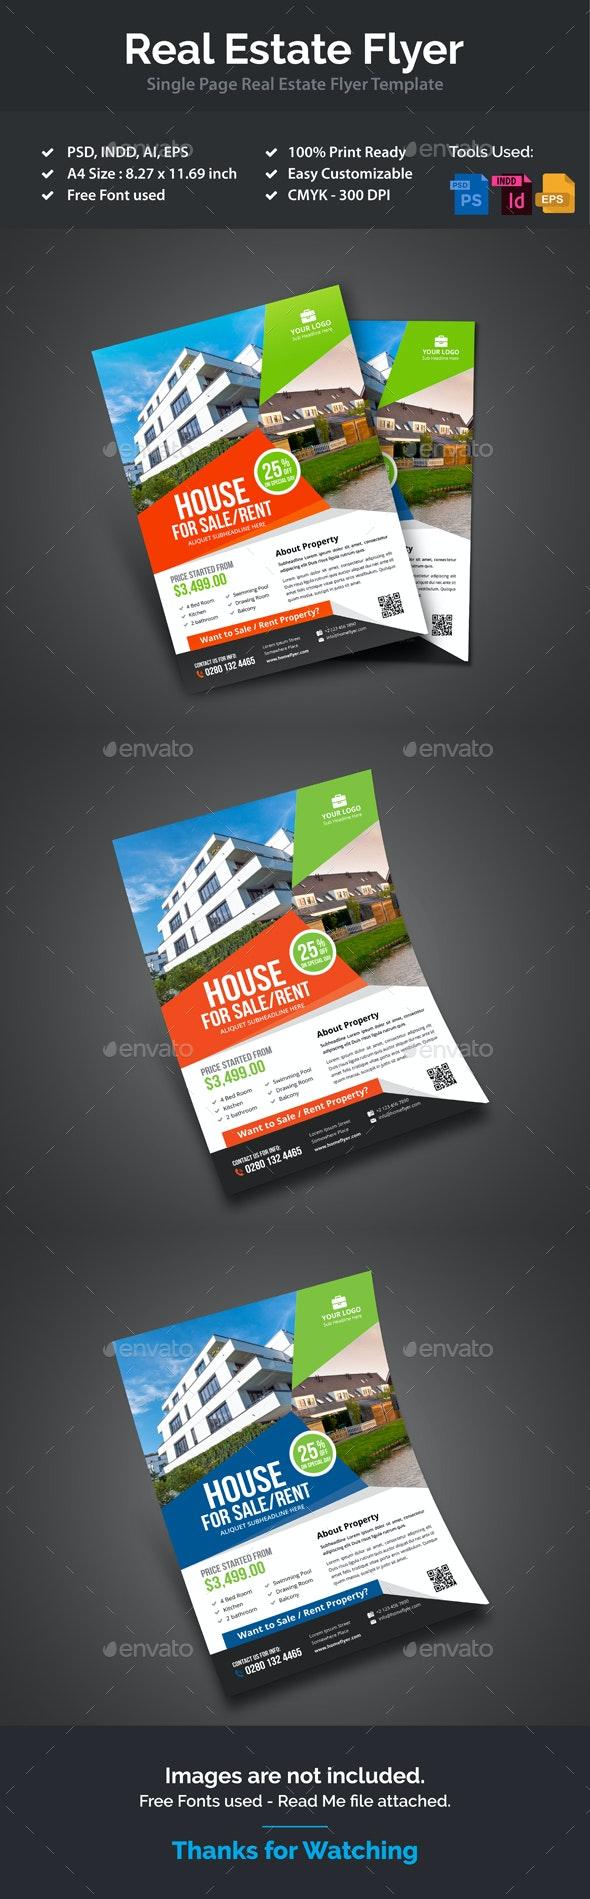 Real Estate Flyer Design - Flyers Print Templates